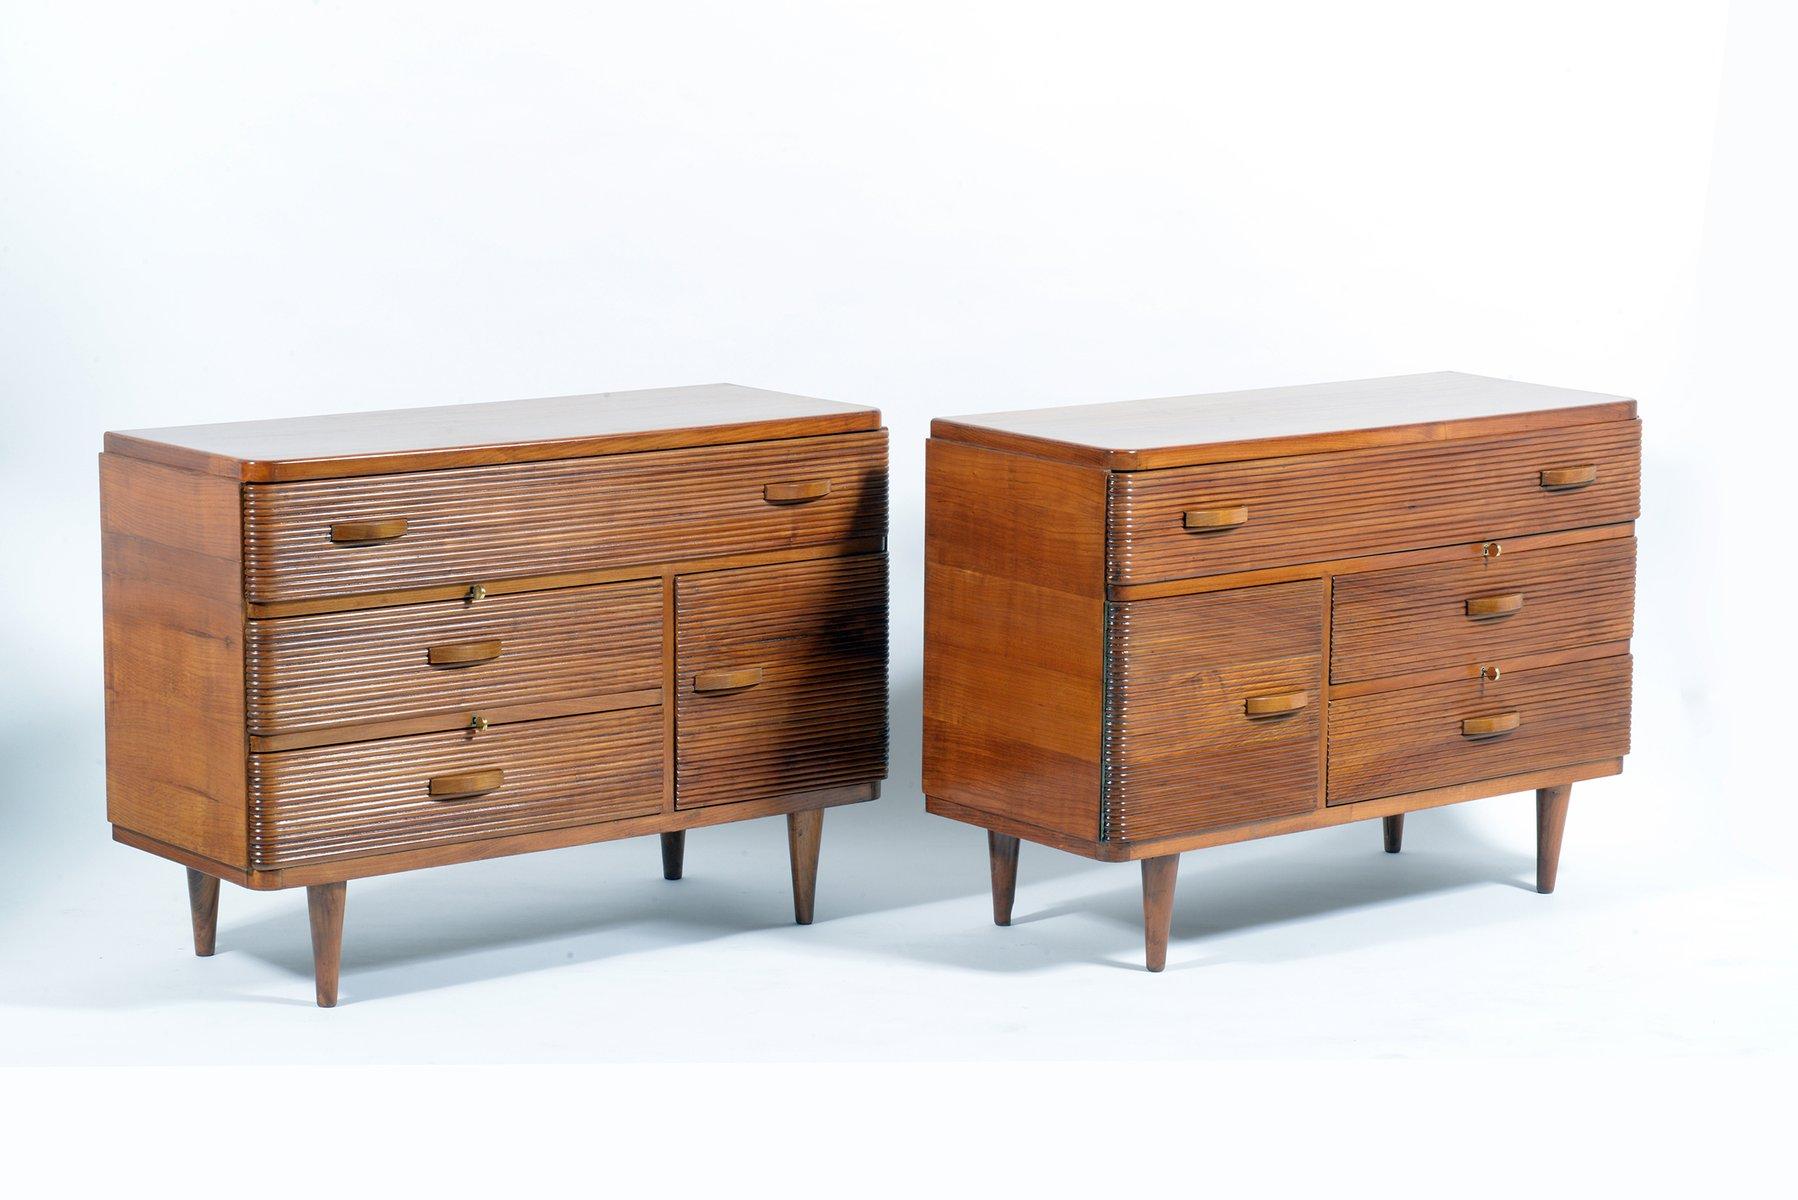 Mid century italian cabinets by gherardo bosio for fagioli for Italian cabinets